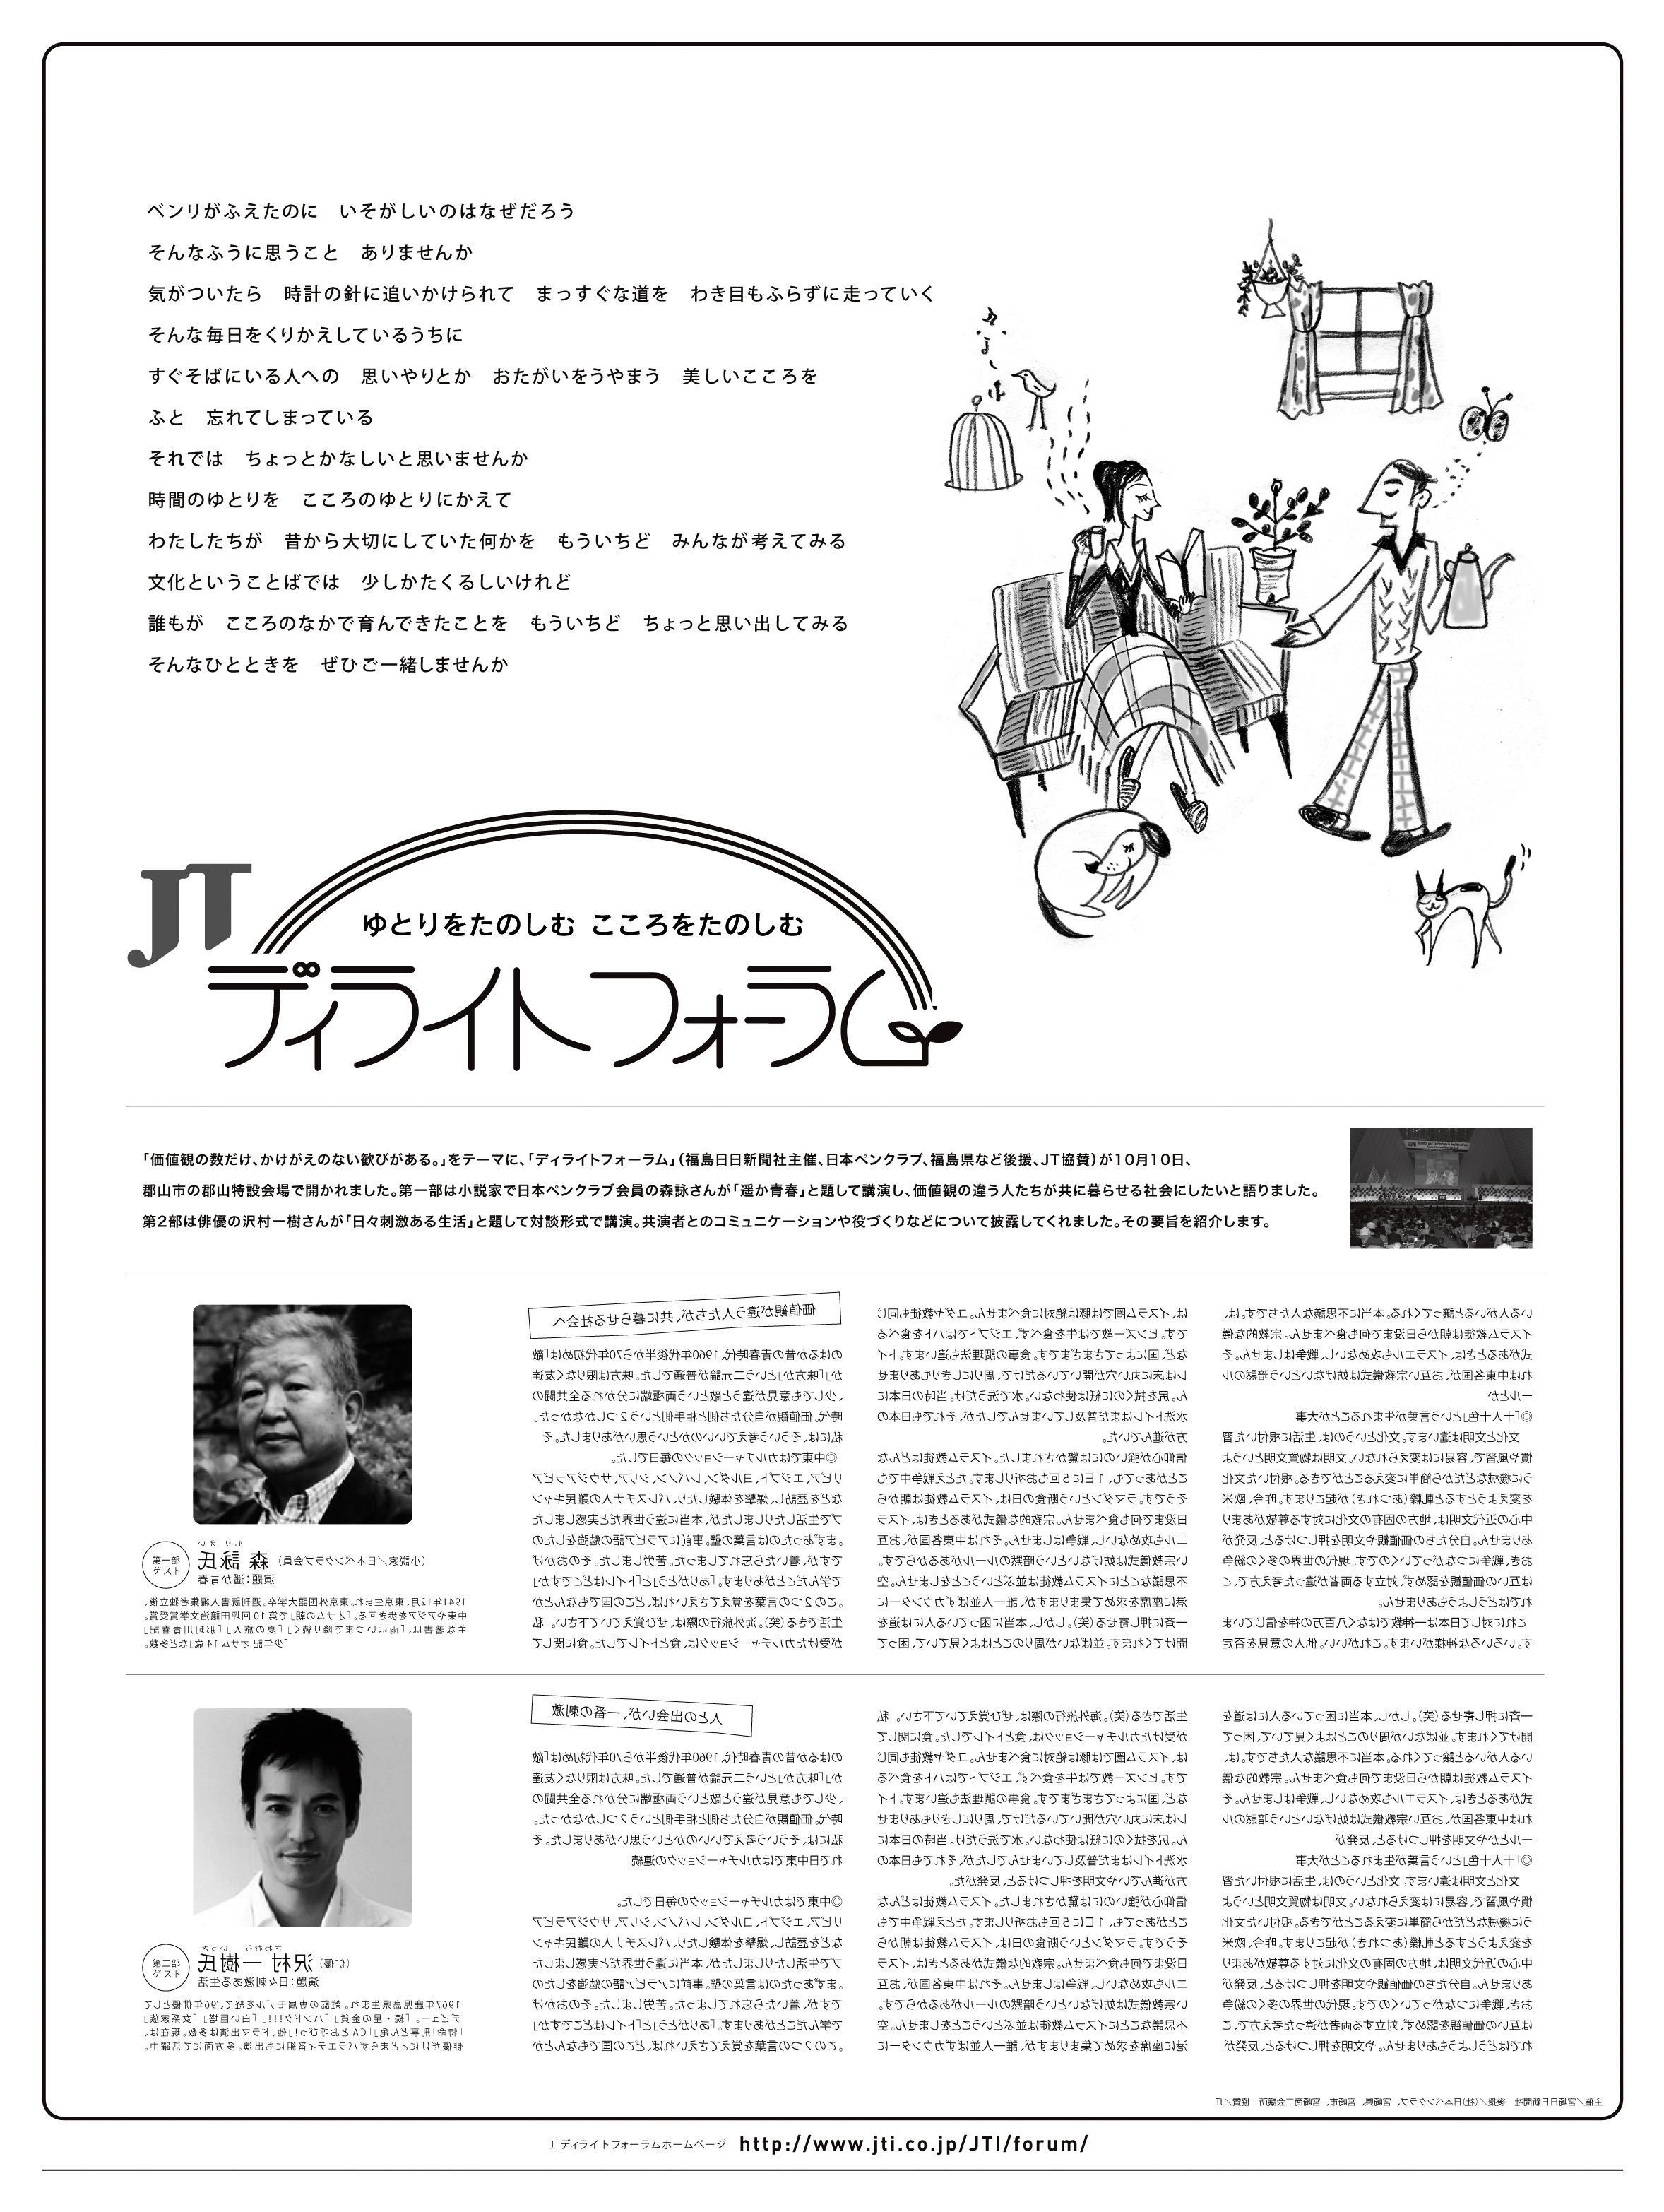 JT日本たばこ 企画新聞広告15段